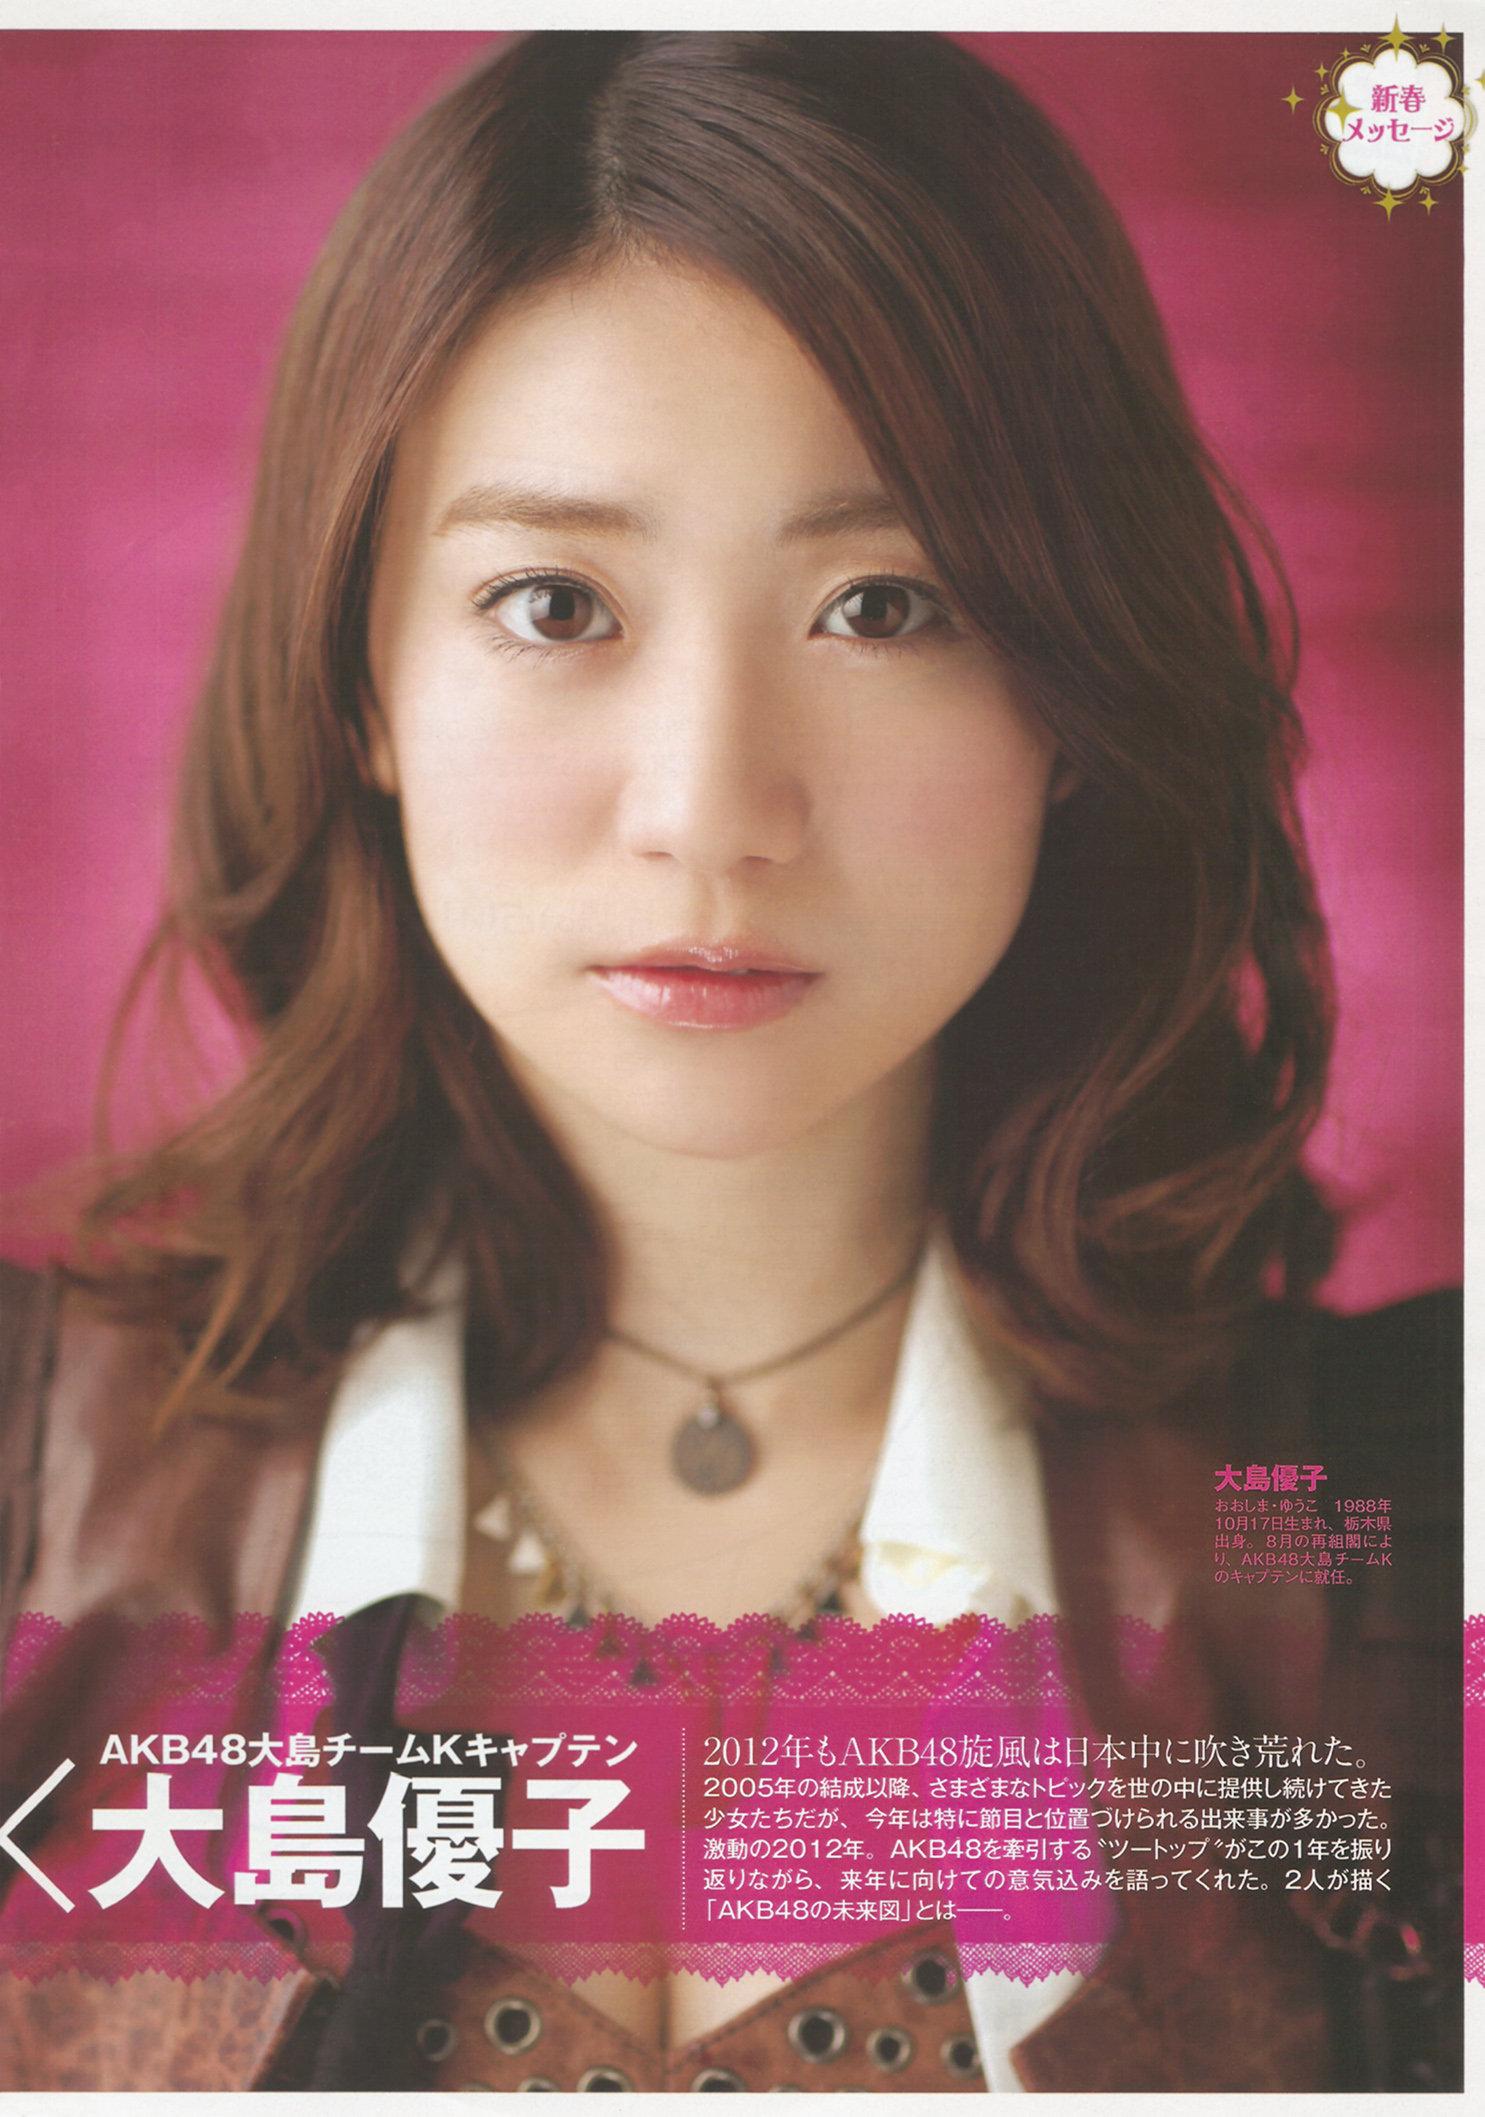 Magazine,%20Oshima%20Yuko-376750.jpg